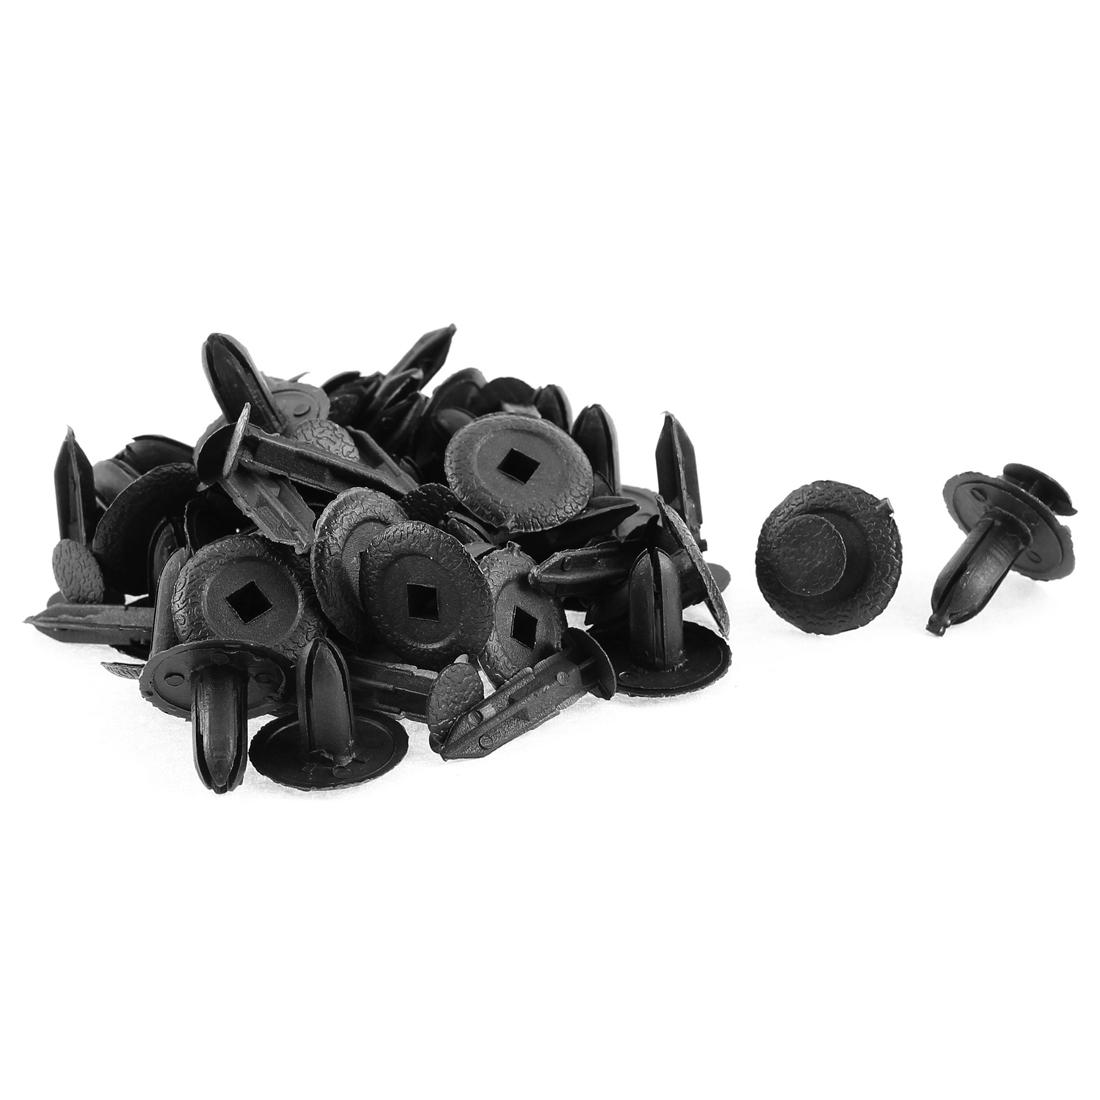 30 Pcs 18mm x 7mm Black Plastic Rivet Bumper Lining Trim Panel Fastener Clips for Mazda